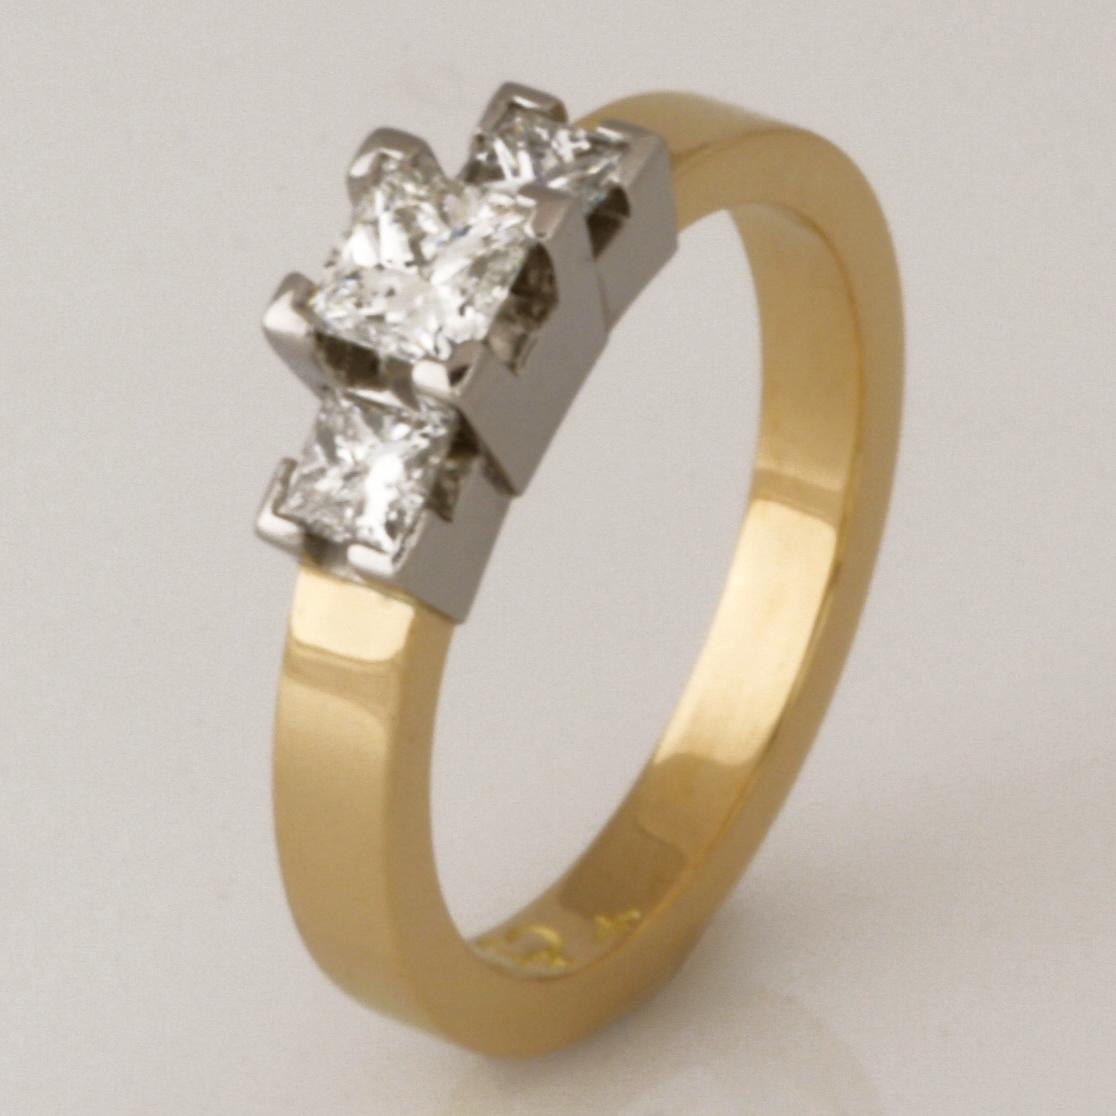 Handmade ladies 18ct yellow and white gold princess cut diamond engagement ring